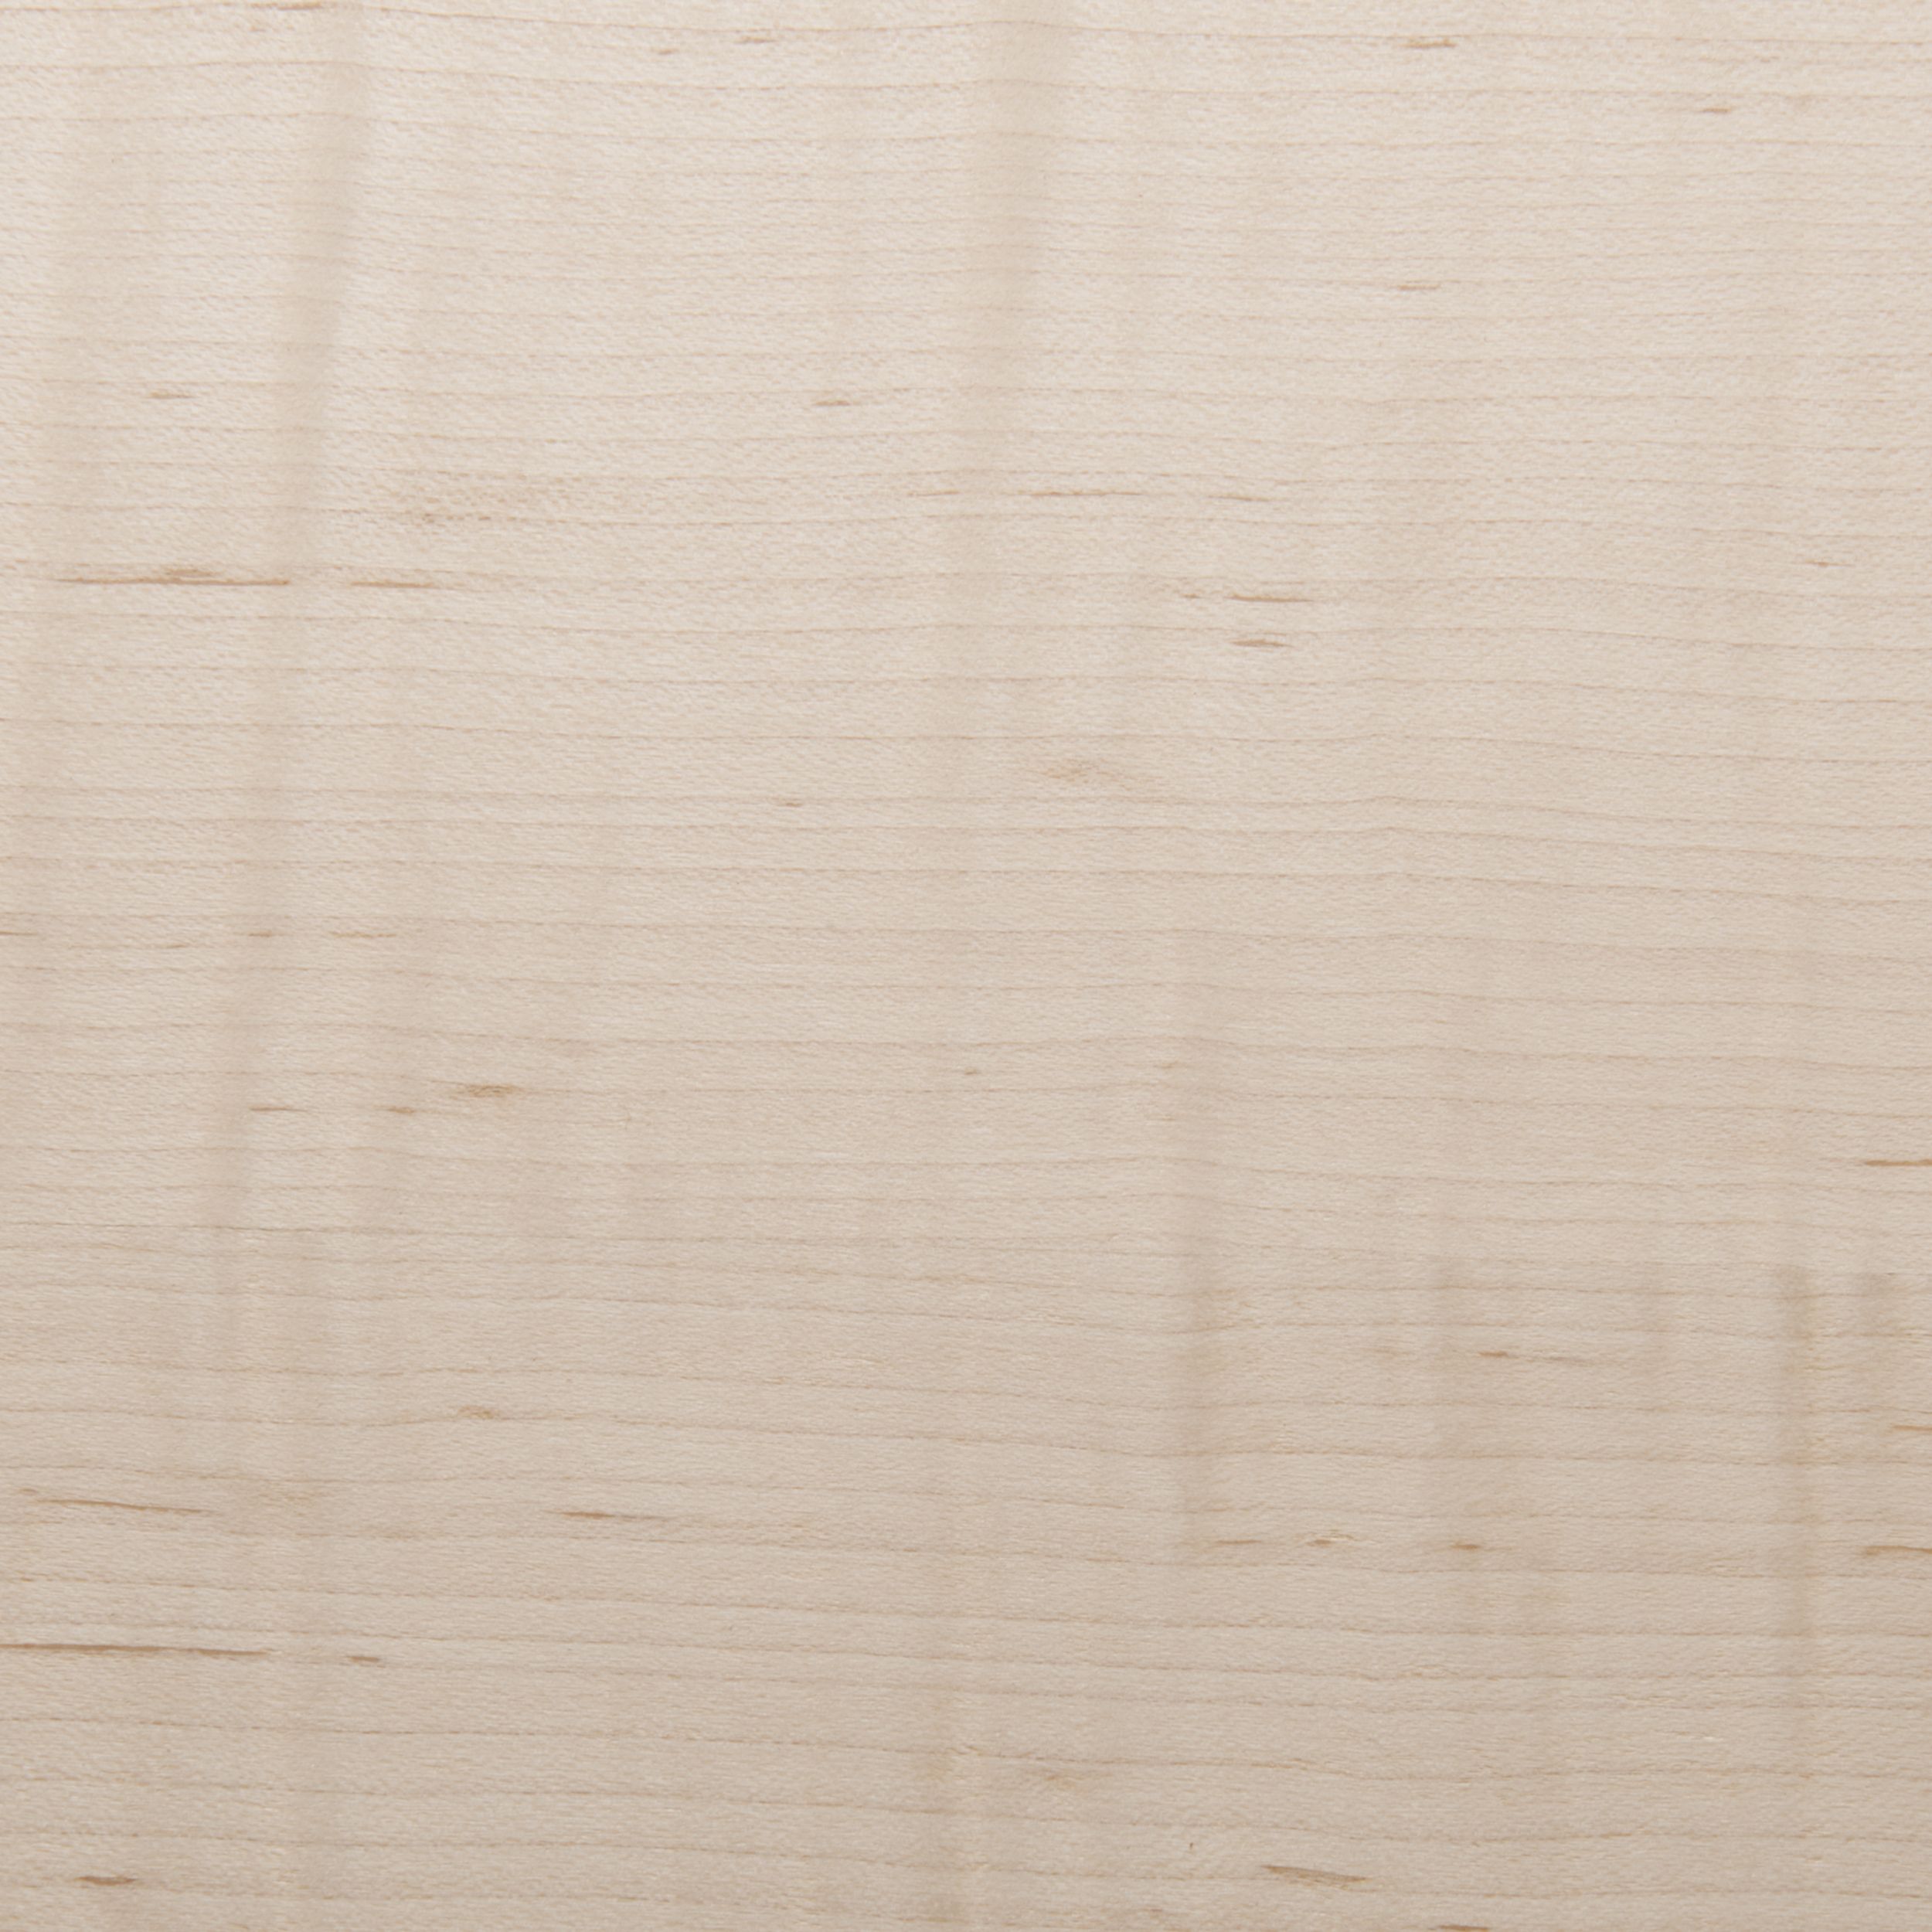 Figured Maple Veneer Sheet Quarter Cut 4' x 8' 2-Ply Wood on Wood